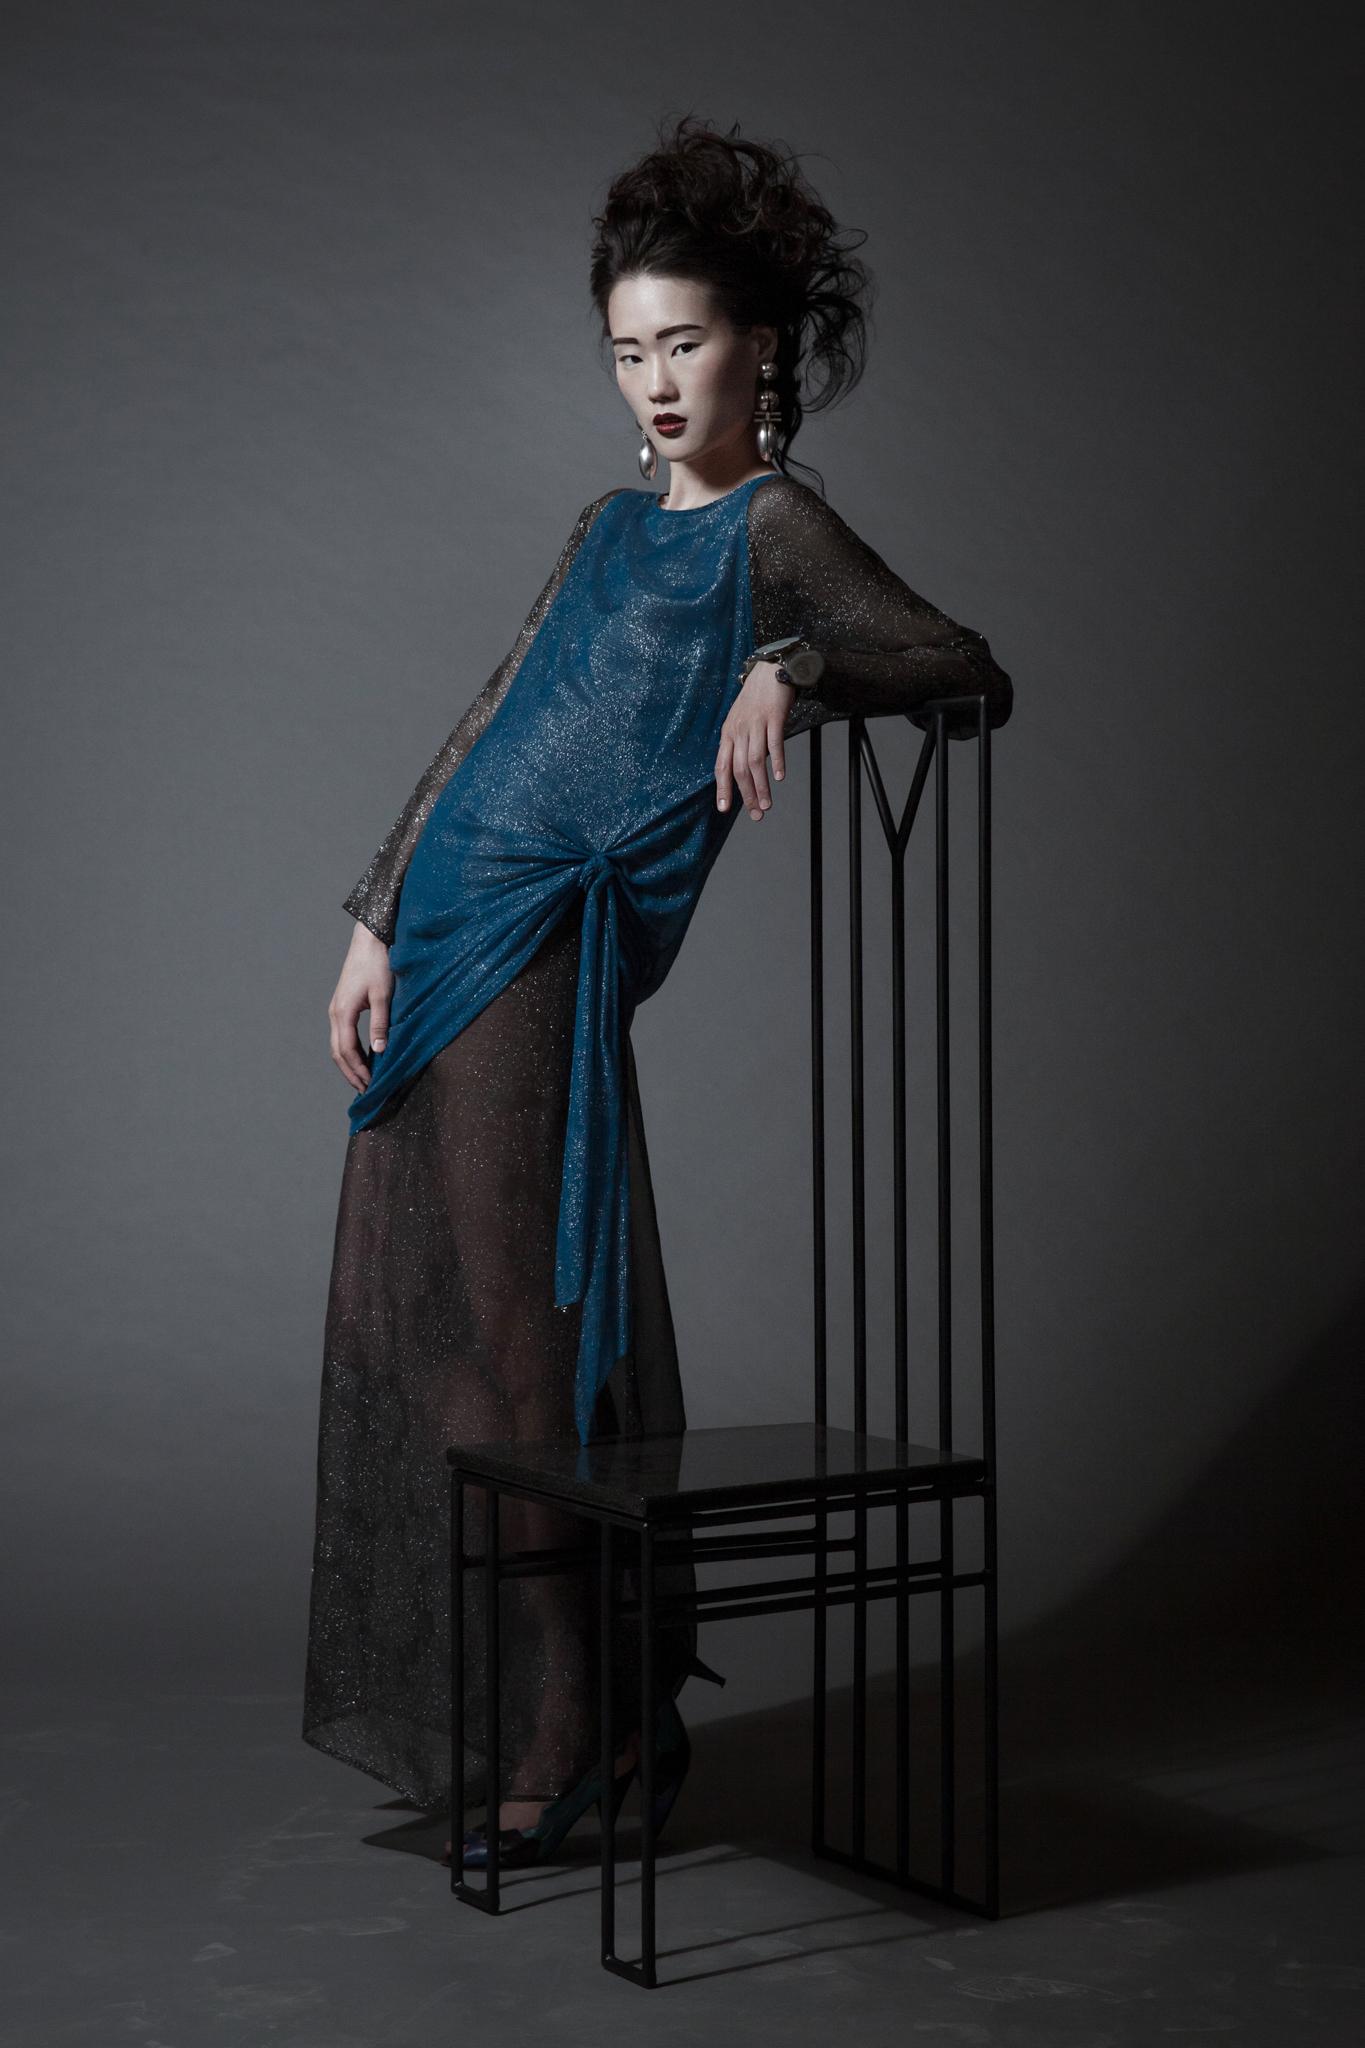 fashion-styling-by-geraldine-duskin-2.jpg